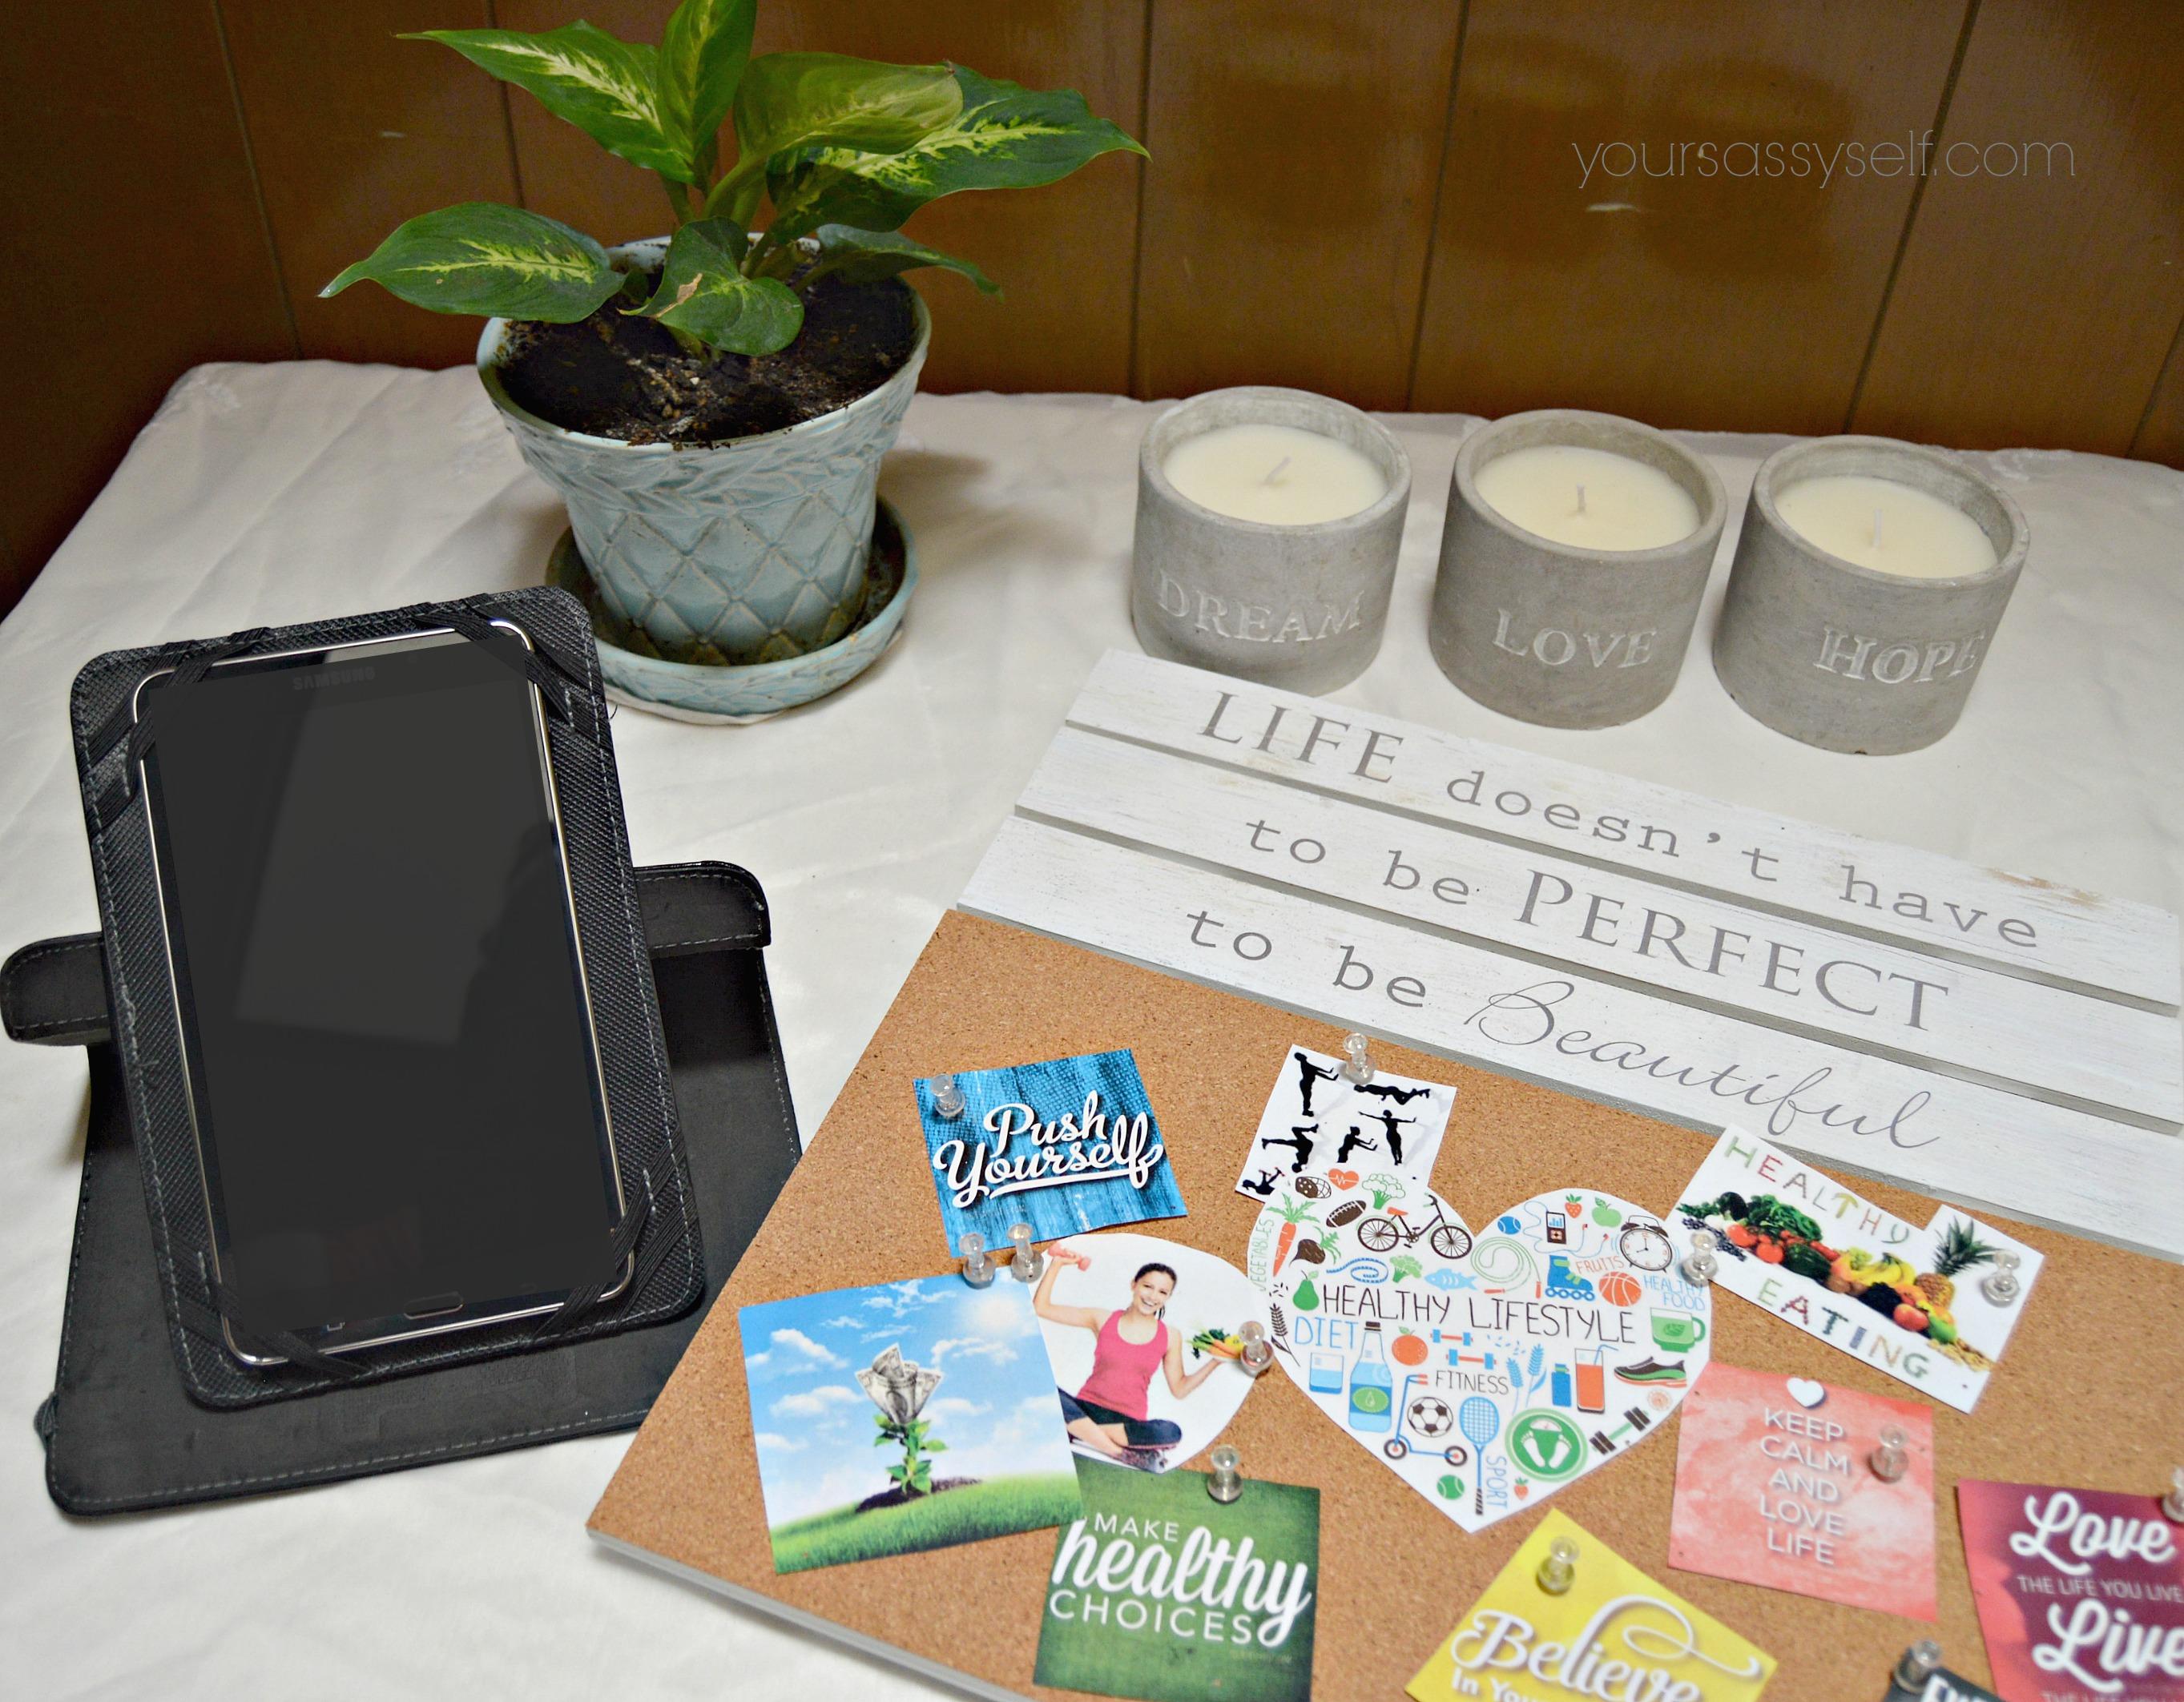 Tablet, plant, candles, vision board wall hanging - yoursassyself.com